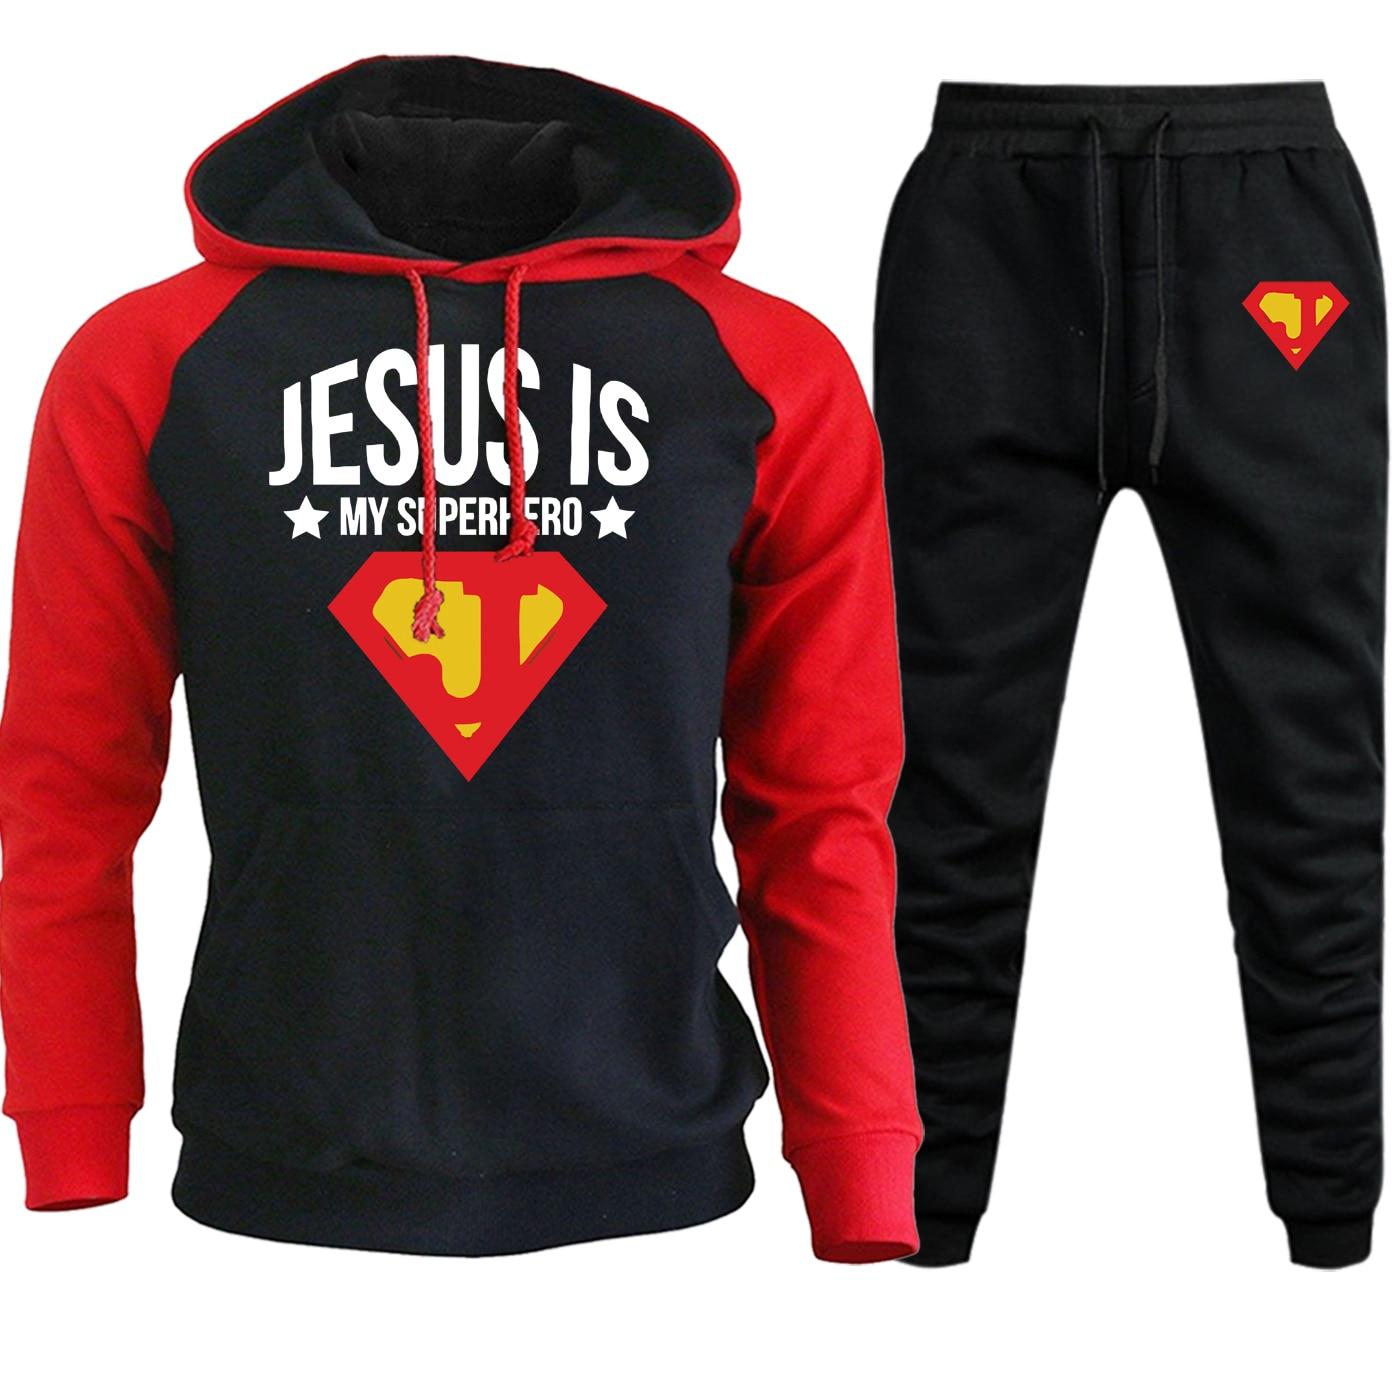 Jesus Is Superhero Hoodies Mens Raglan Sweatshirts Autumn Winter Casual Hooded Suit Male Fleece Pullover+Sweatpants 2 Piece Set